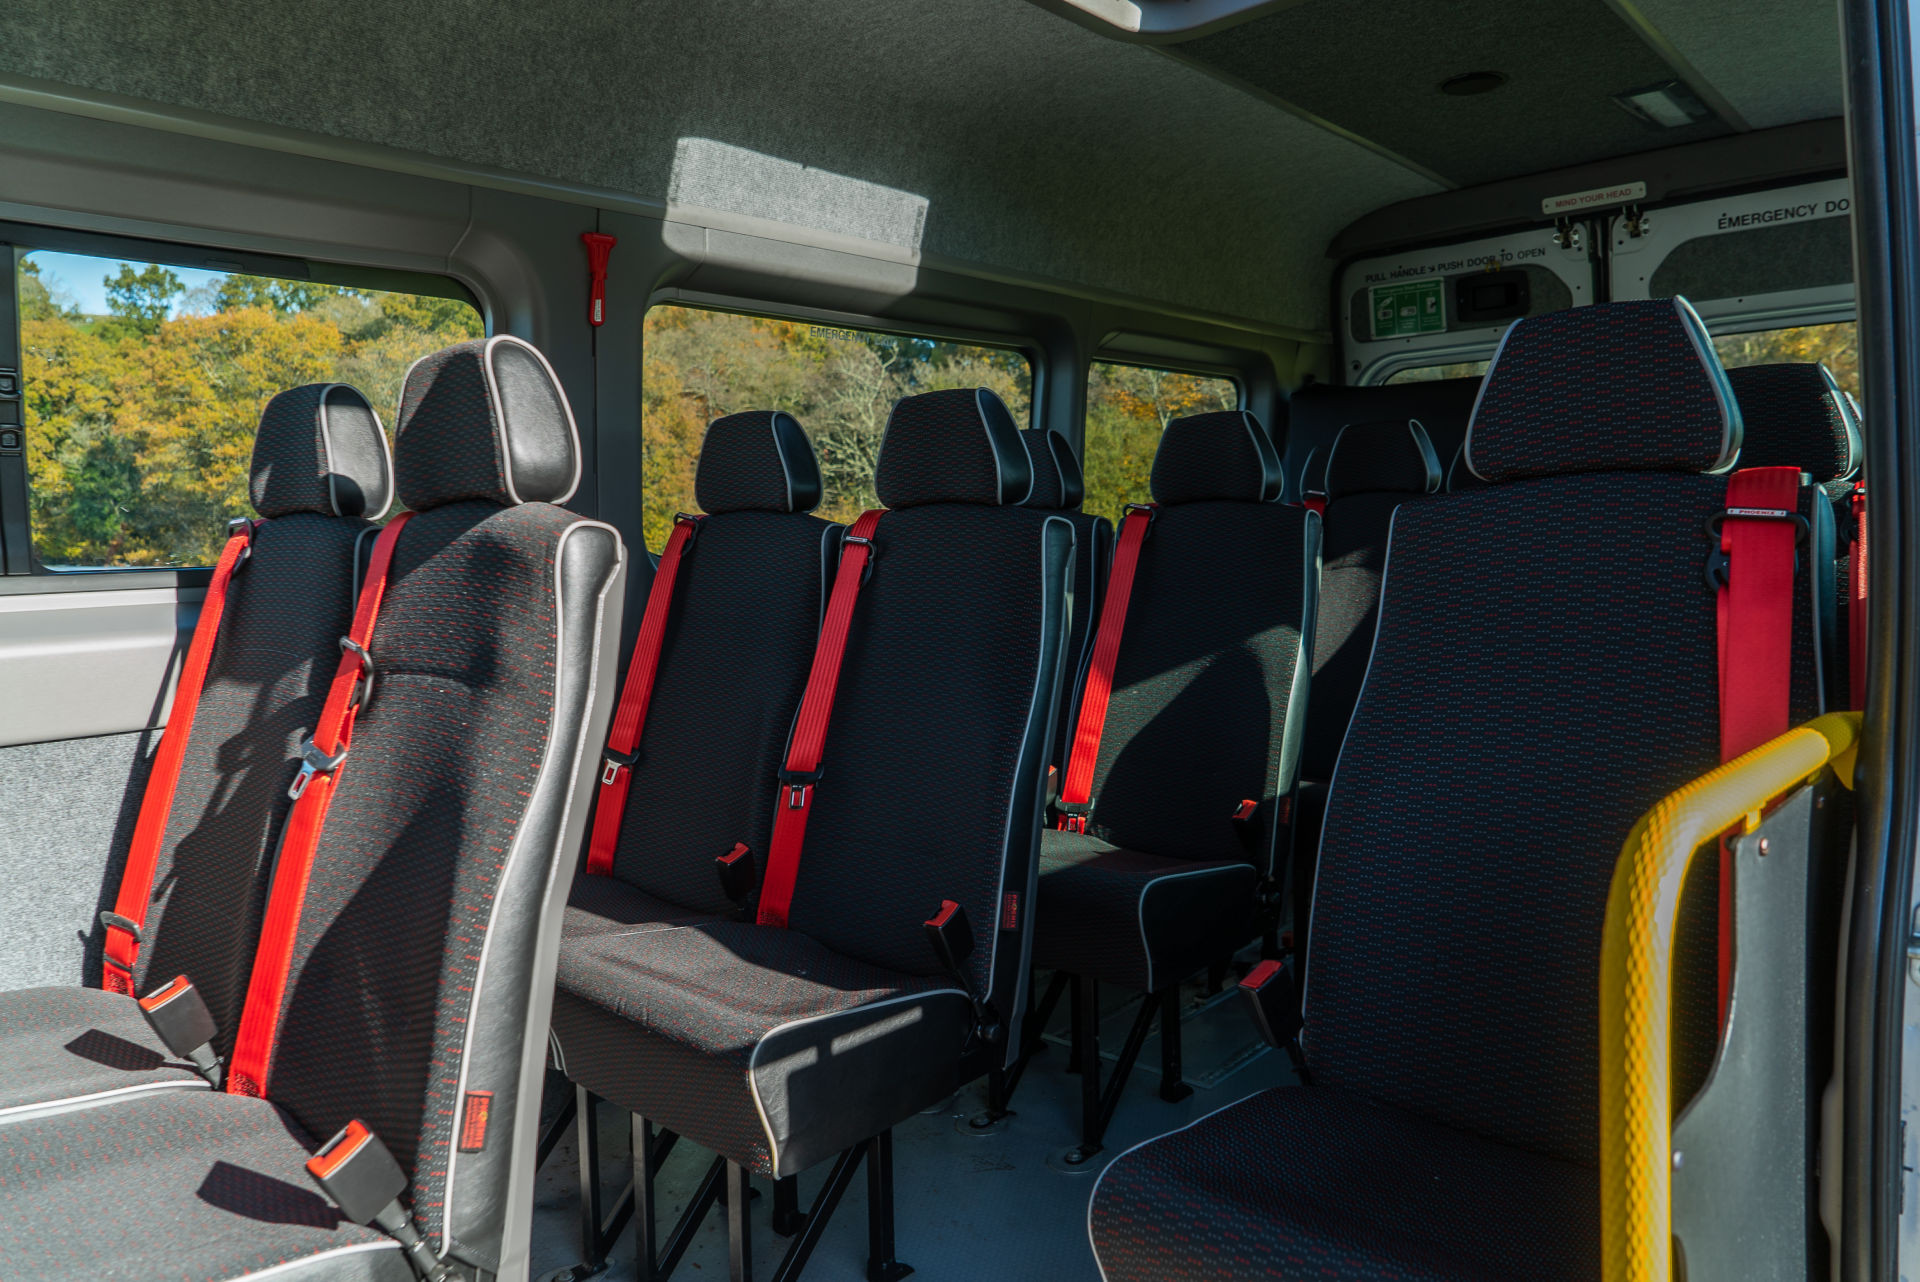 2017 Peugeot Boxer 17 Seater Accessible Minibus for Sale - Image 2